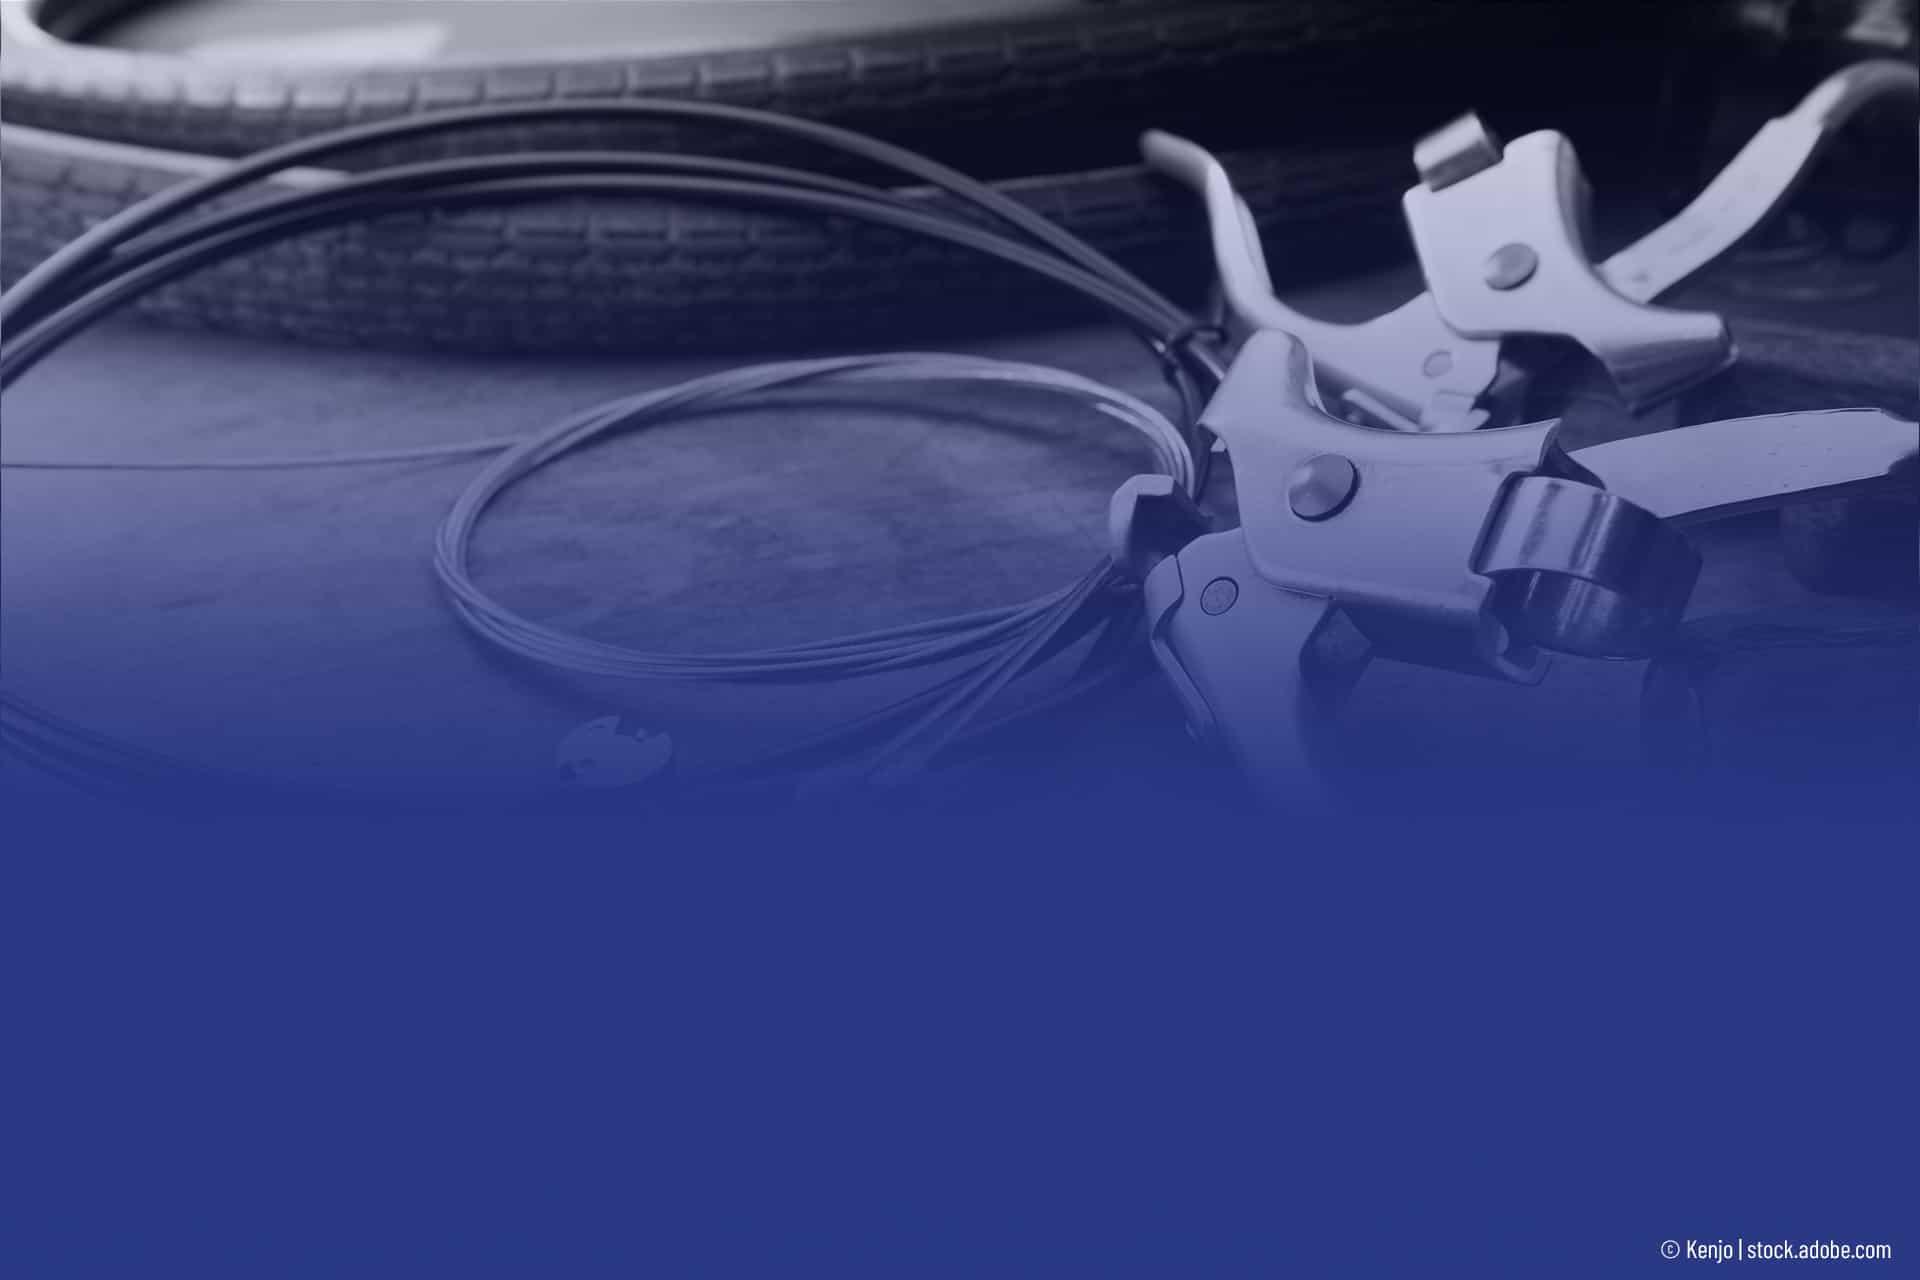 blog fahrrad bremszug wechseln